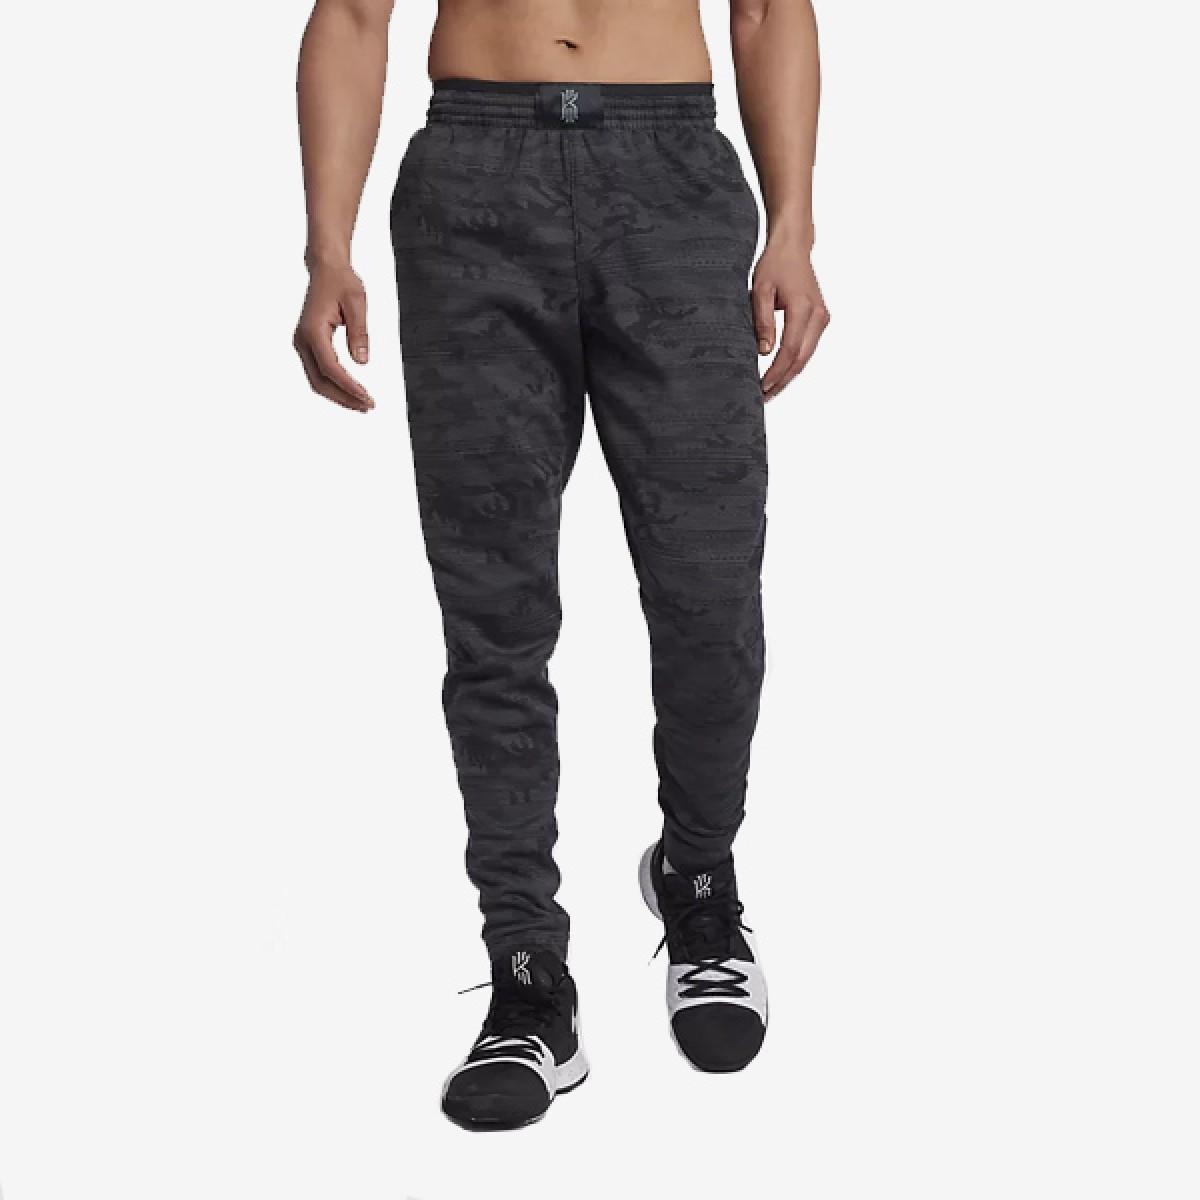 Nike Dry Kyrie Showtime Pants 'Black'